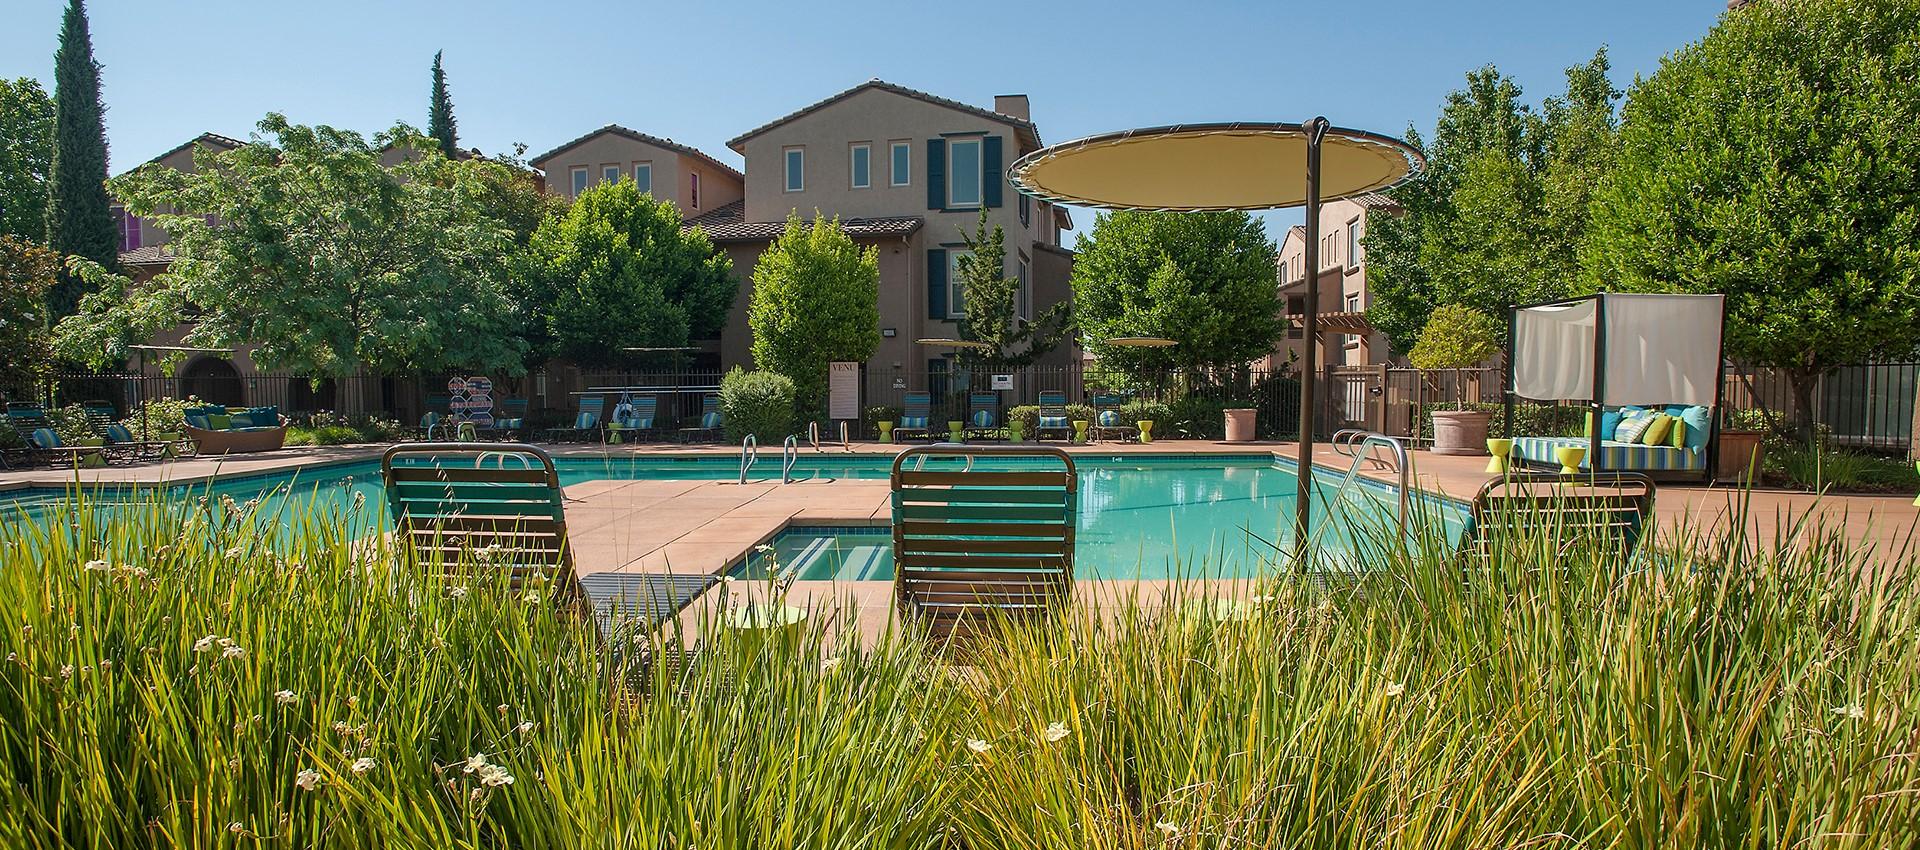 View photos of our luxurious property at Venu at Galleria Condominium Rentals in Roseville, CA